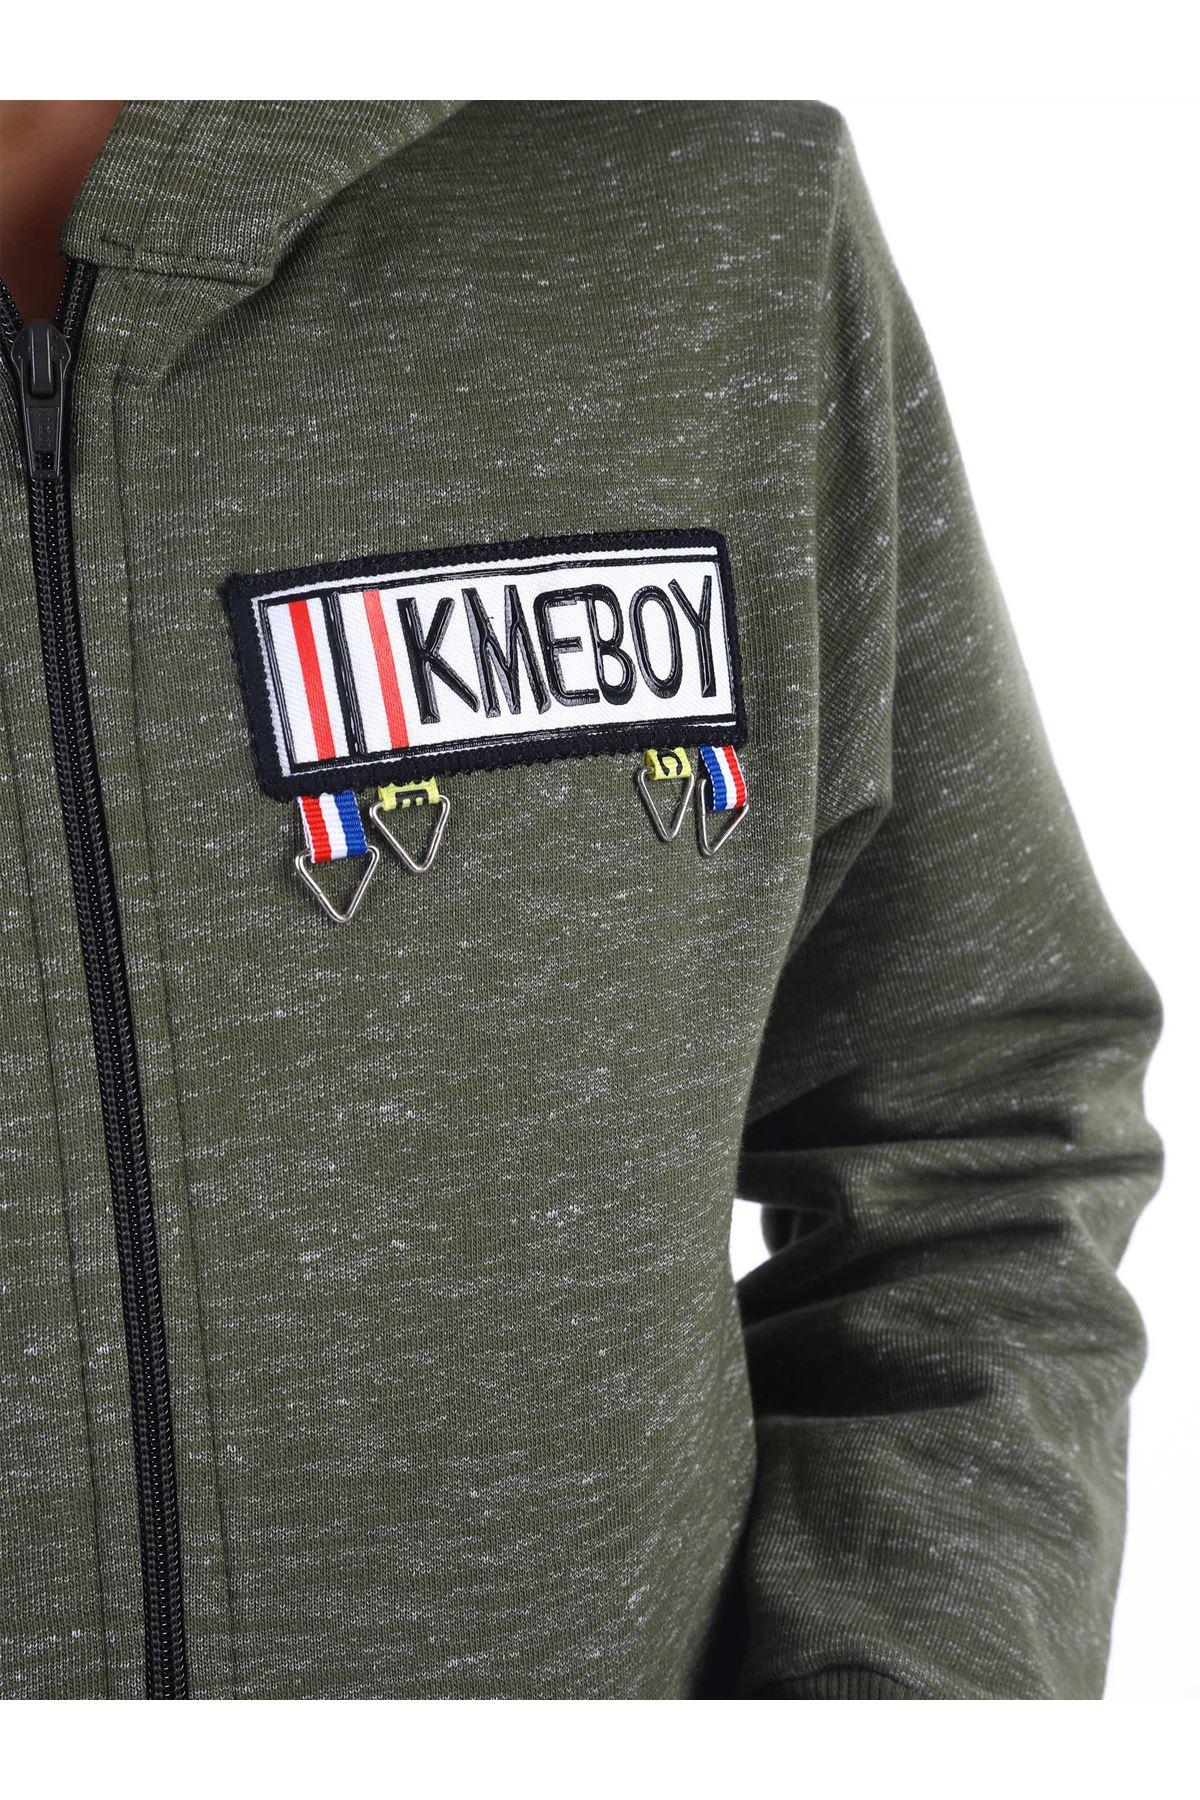 Khaki Size Jacket Teenage Clothing Seasonal Cotton Casual Jacket Coat Outfits 2021 Seasonal Models